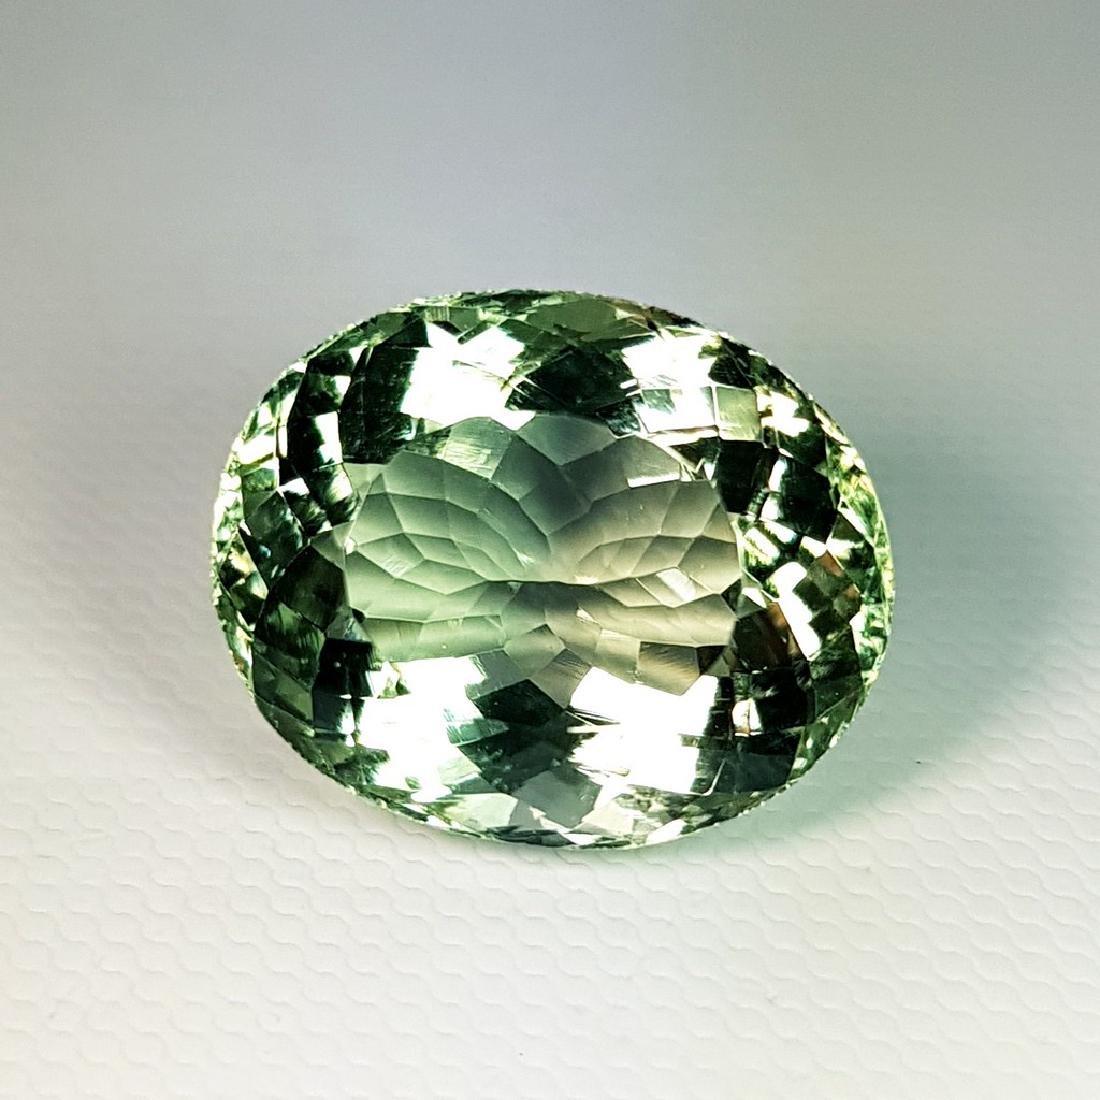 Green Amethyst - 19.22 ct